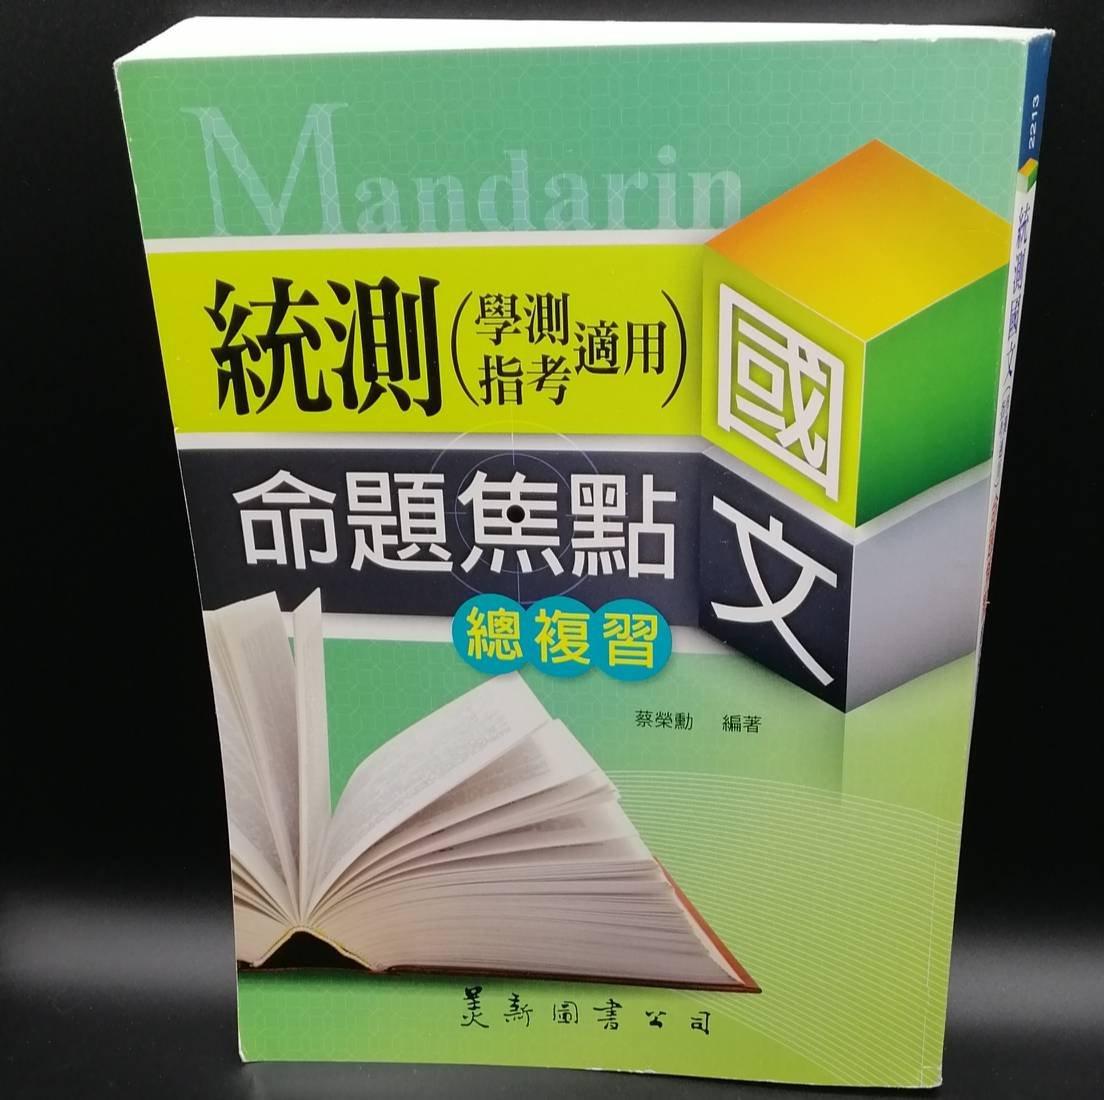 【sigmanet家庭 】九成八新統測(學測指考 )國文命題焦點總複習